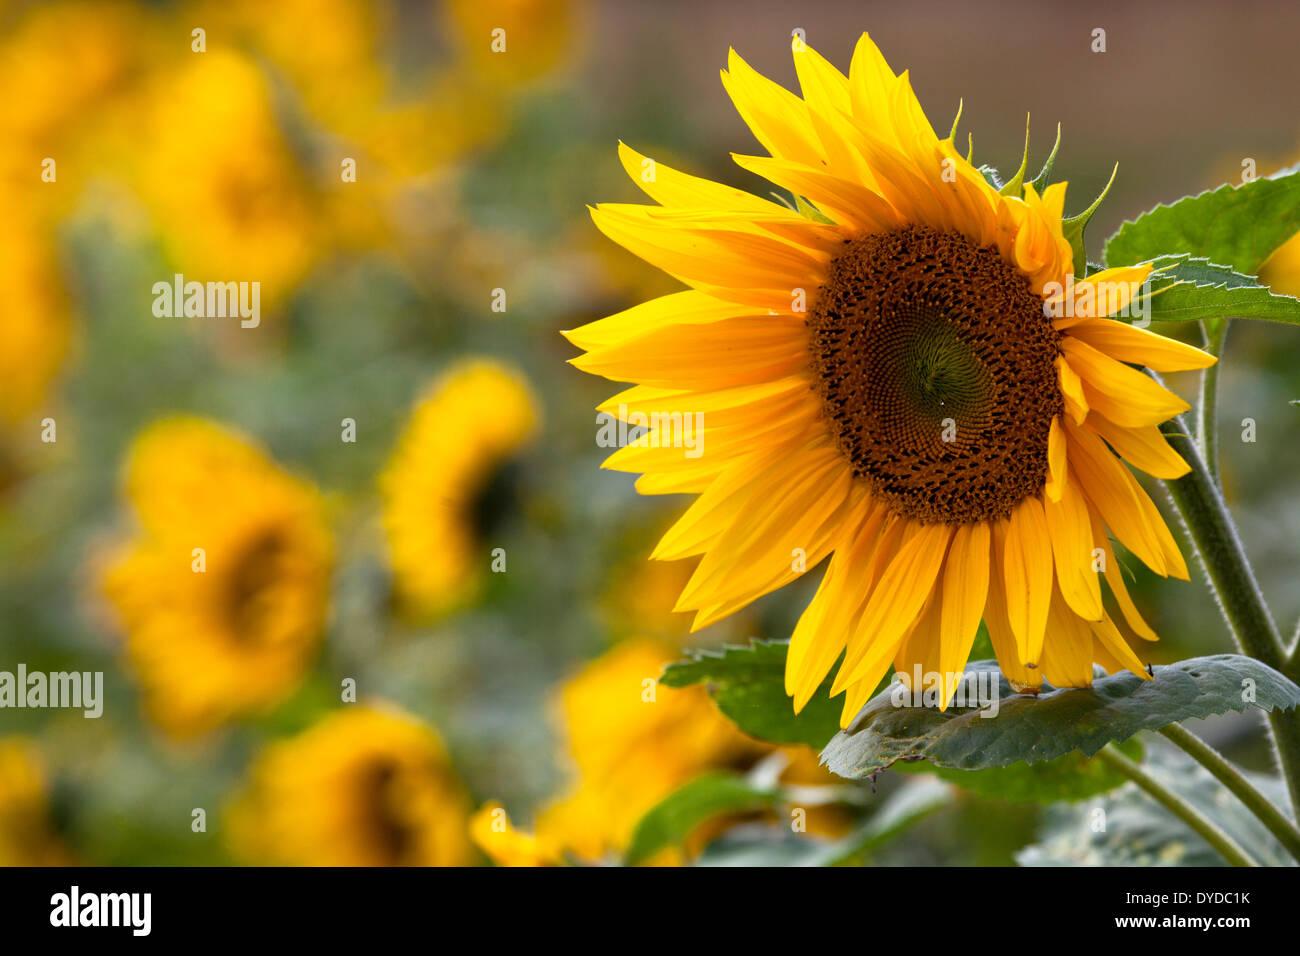 Sunflowers growing alongside a road to a farmhouse. - Stock Image